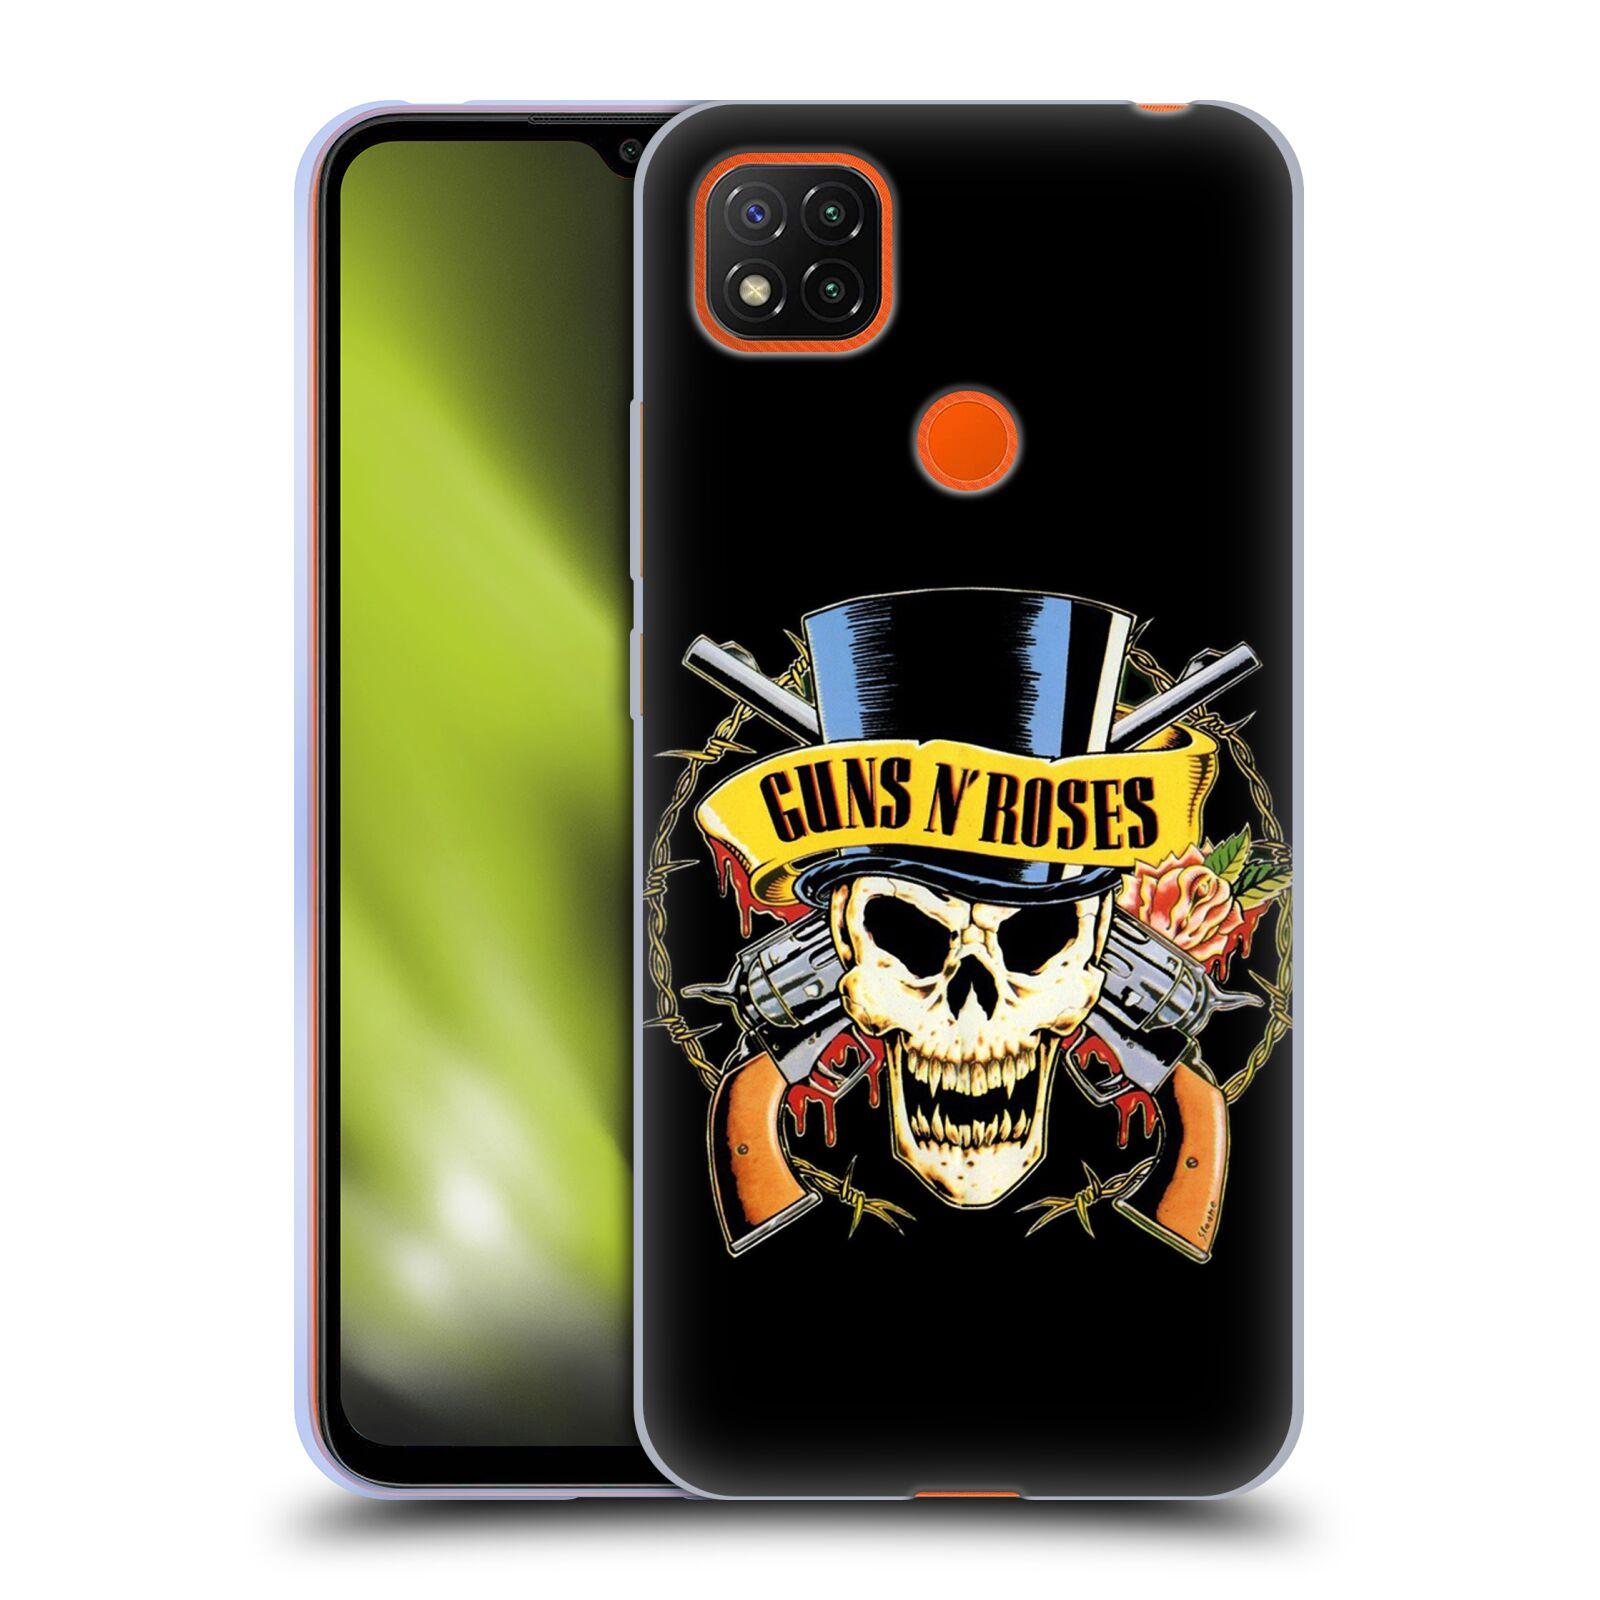 Silikonové pouzdro na mobil Xiaomi Redmi 9C - Head Case - Guns N' Roses - Lebka